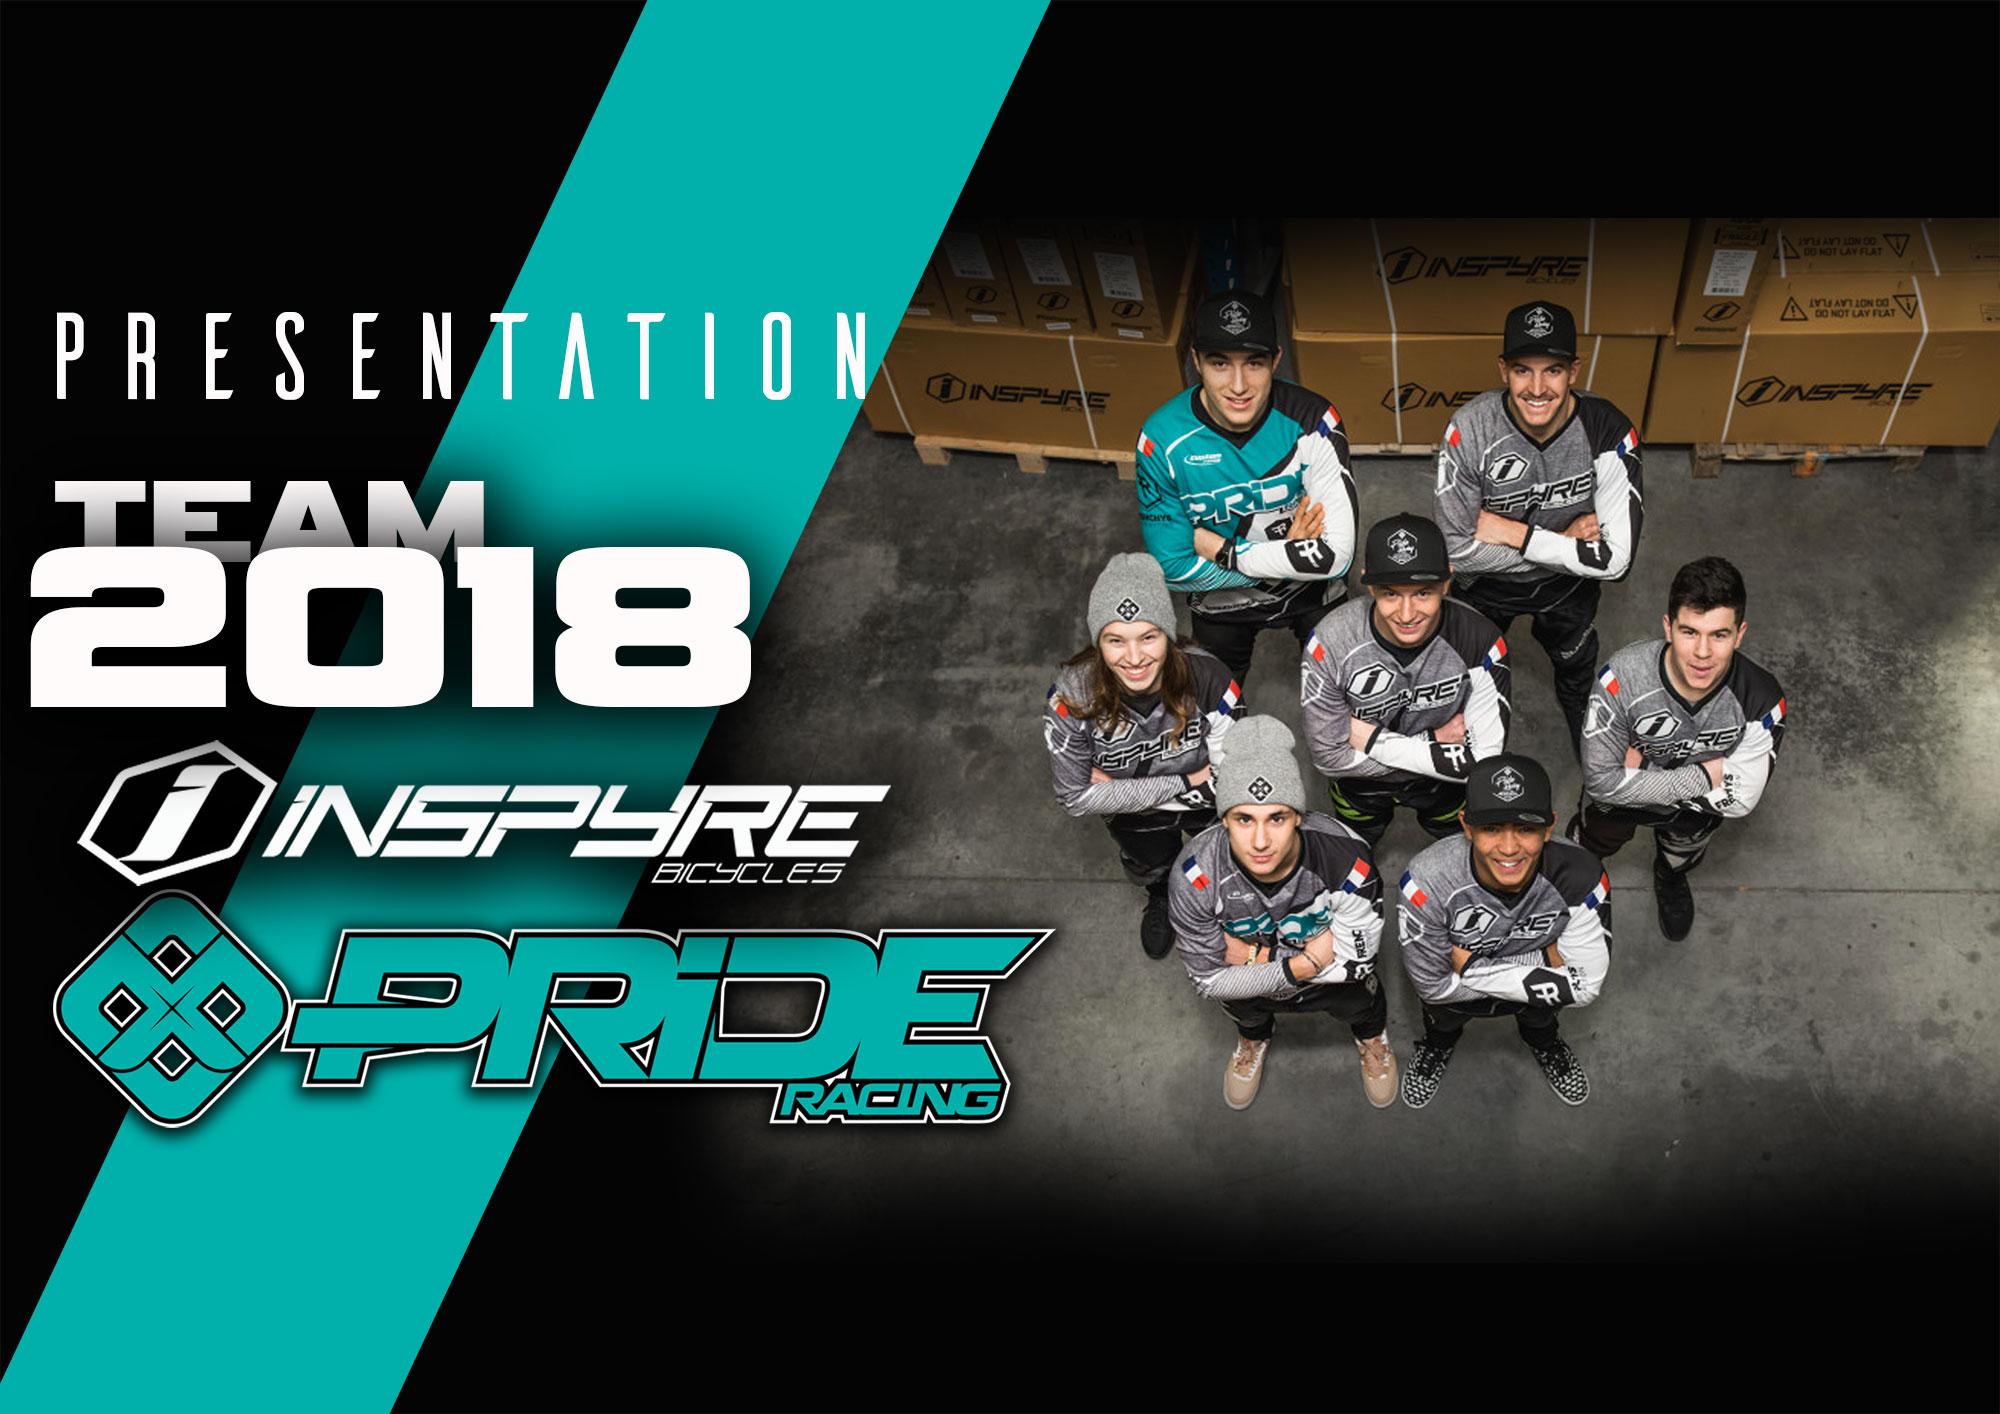 PRESENTATION TEAM PRIDE & INSPYRE 2018